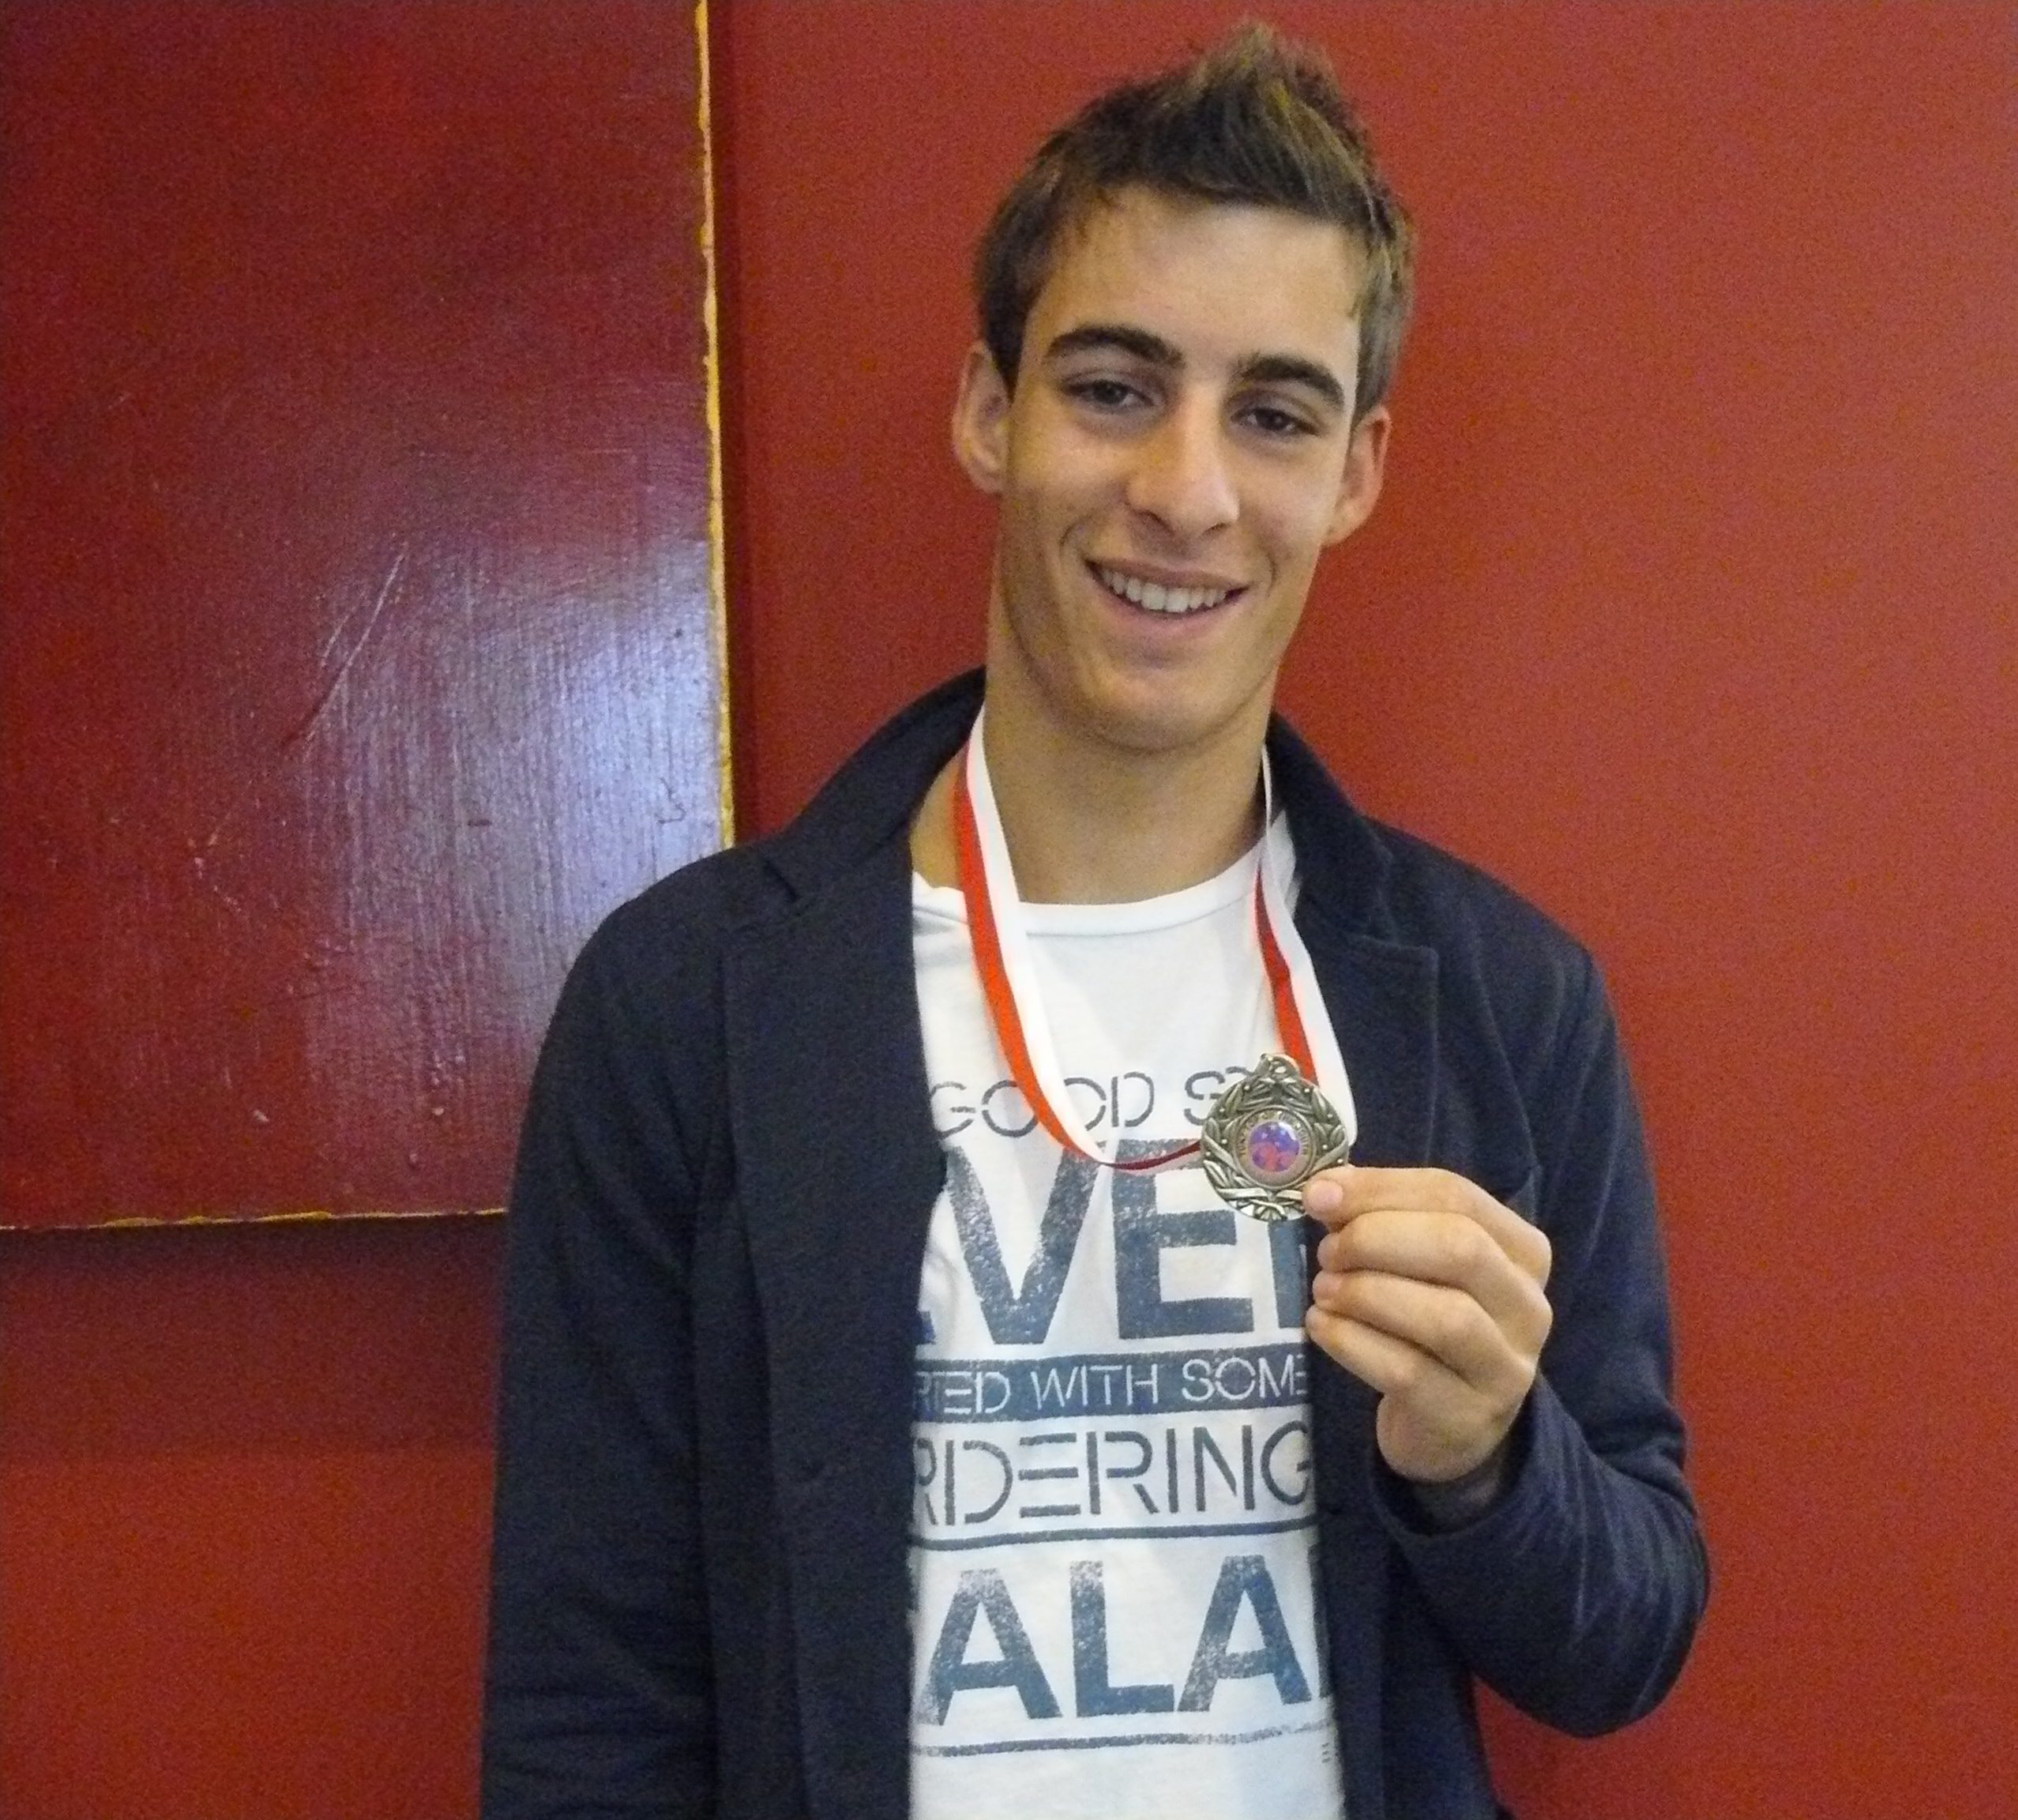 Victor Francey Taekwondo Champion